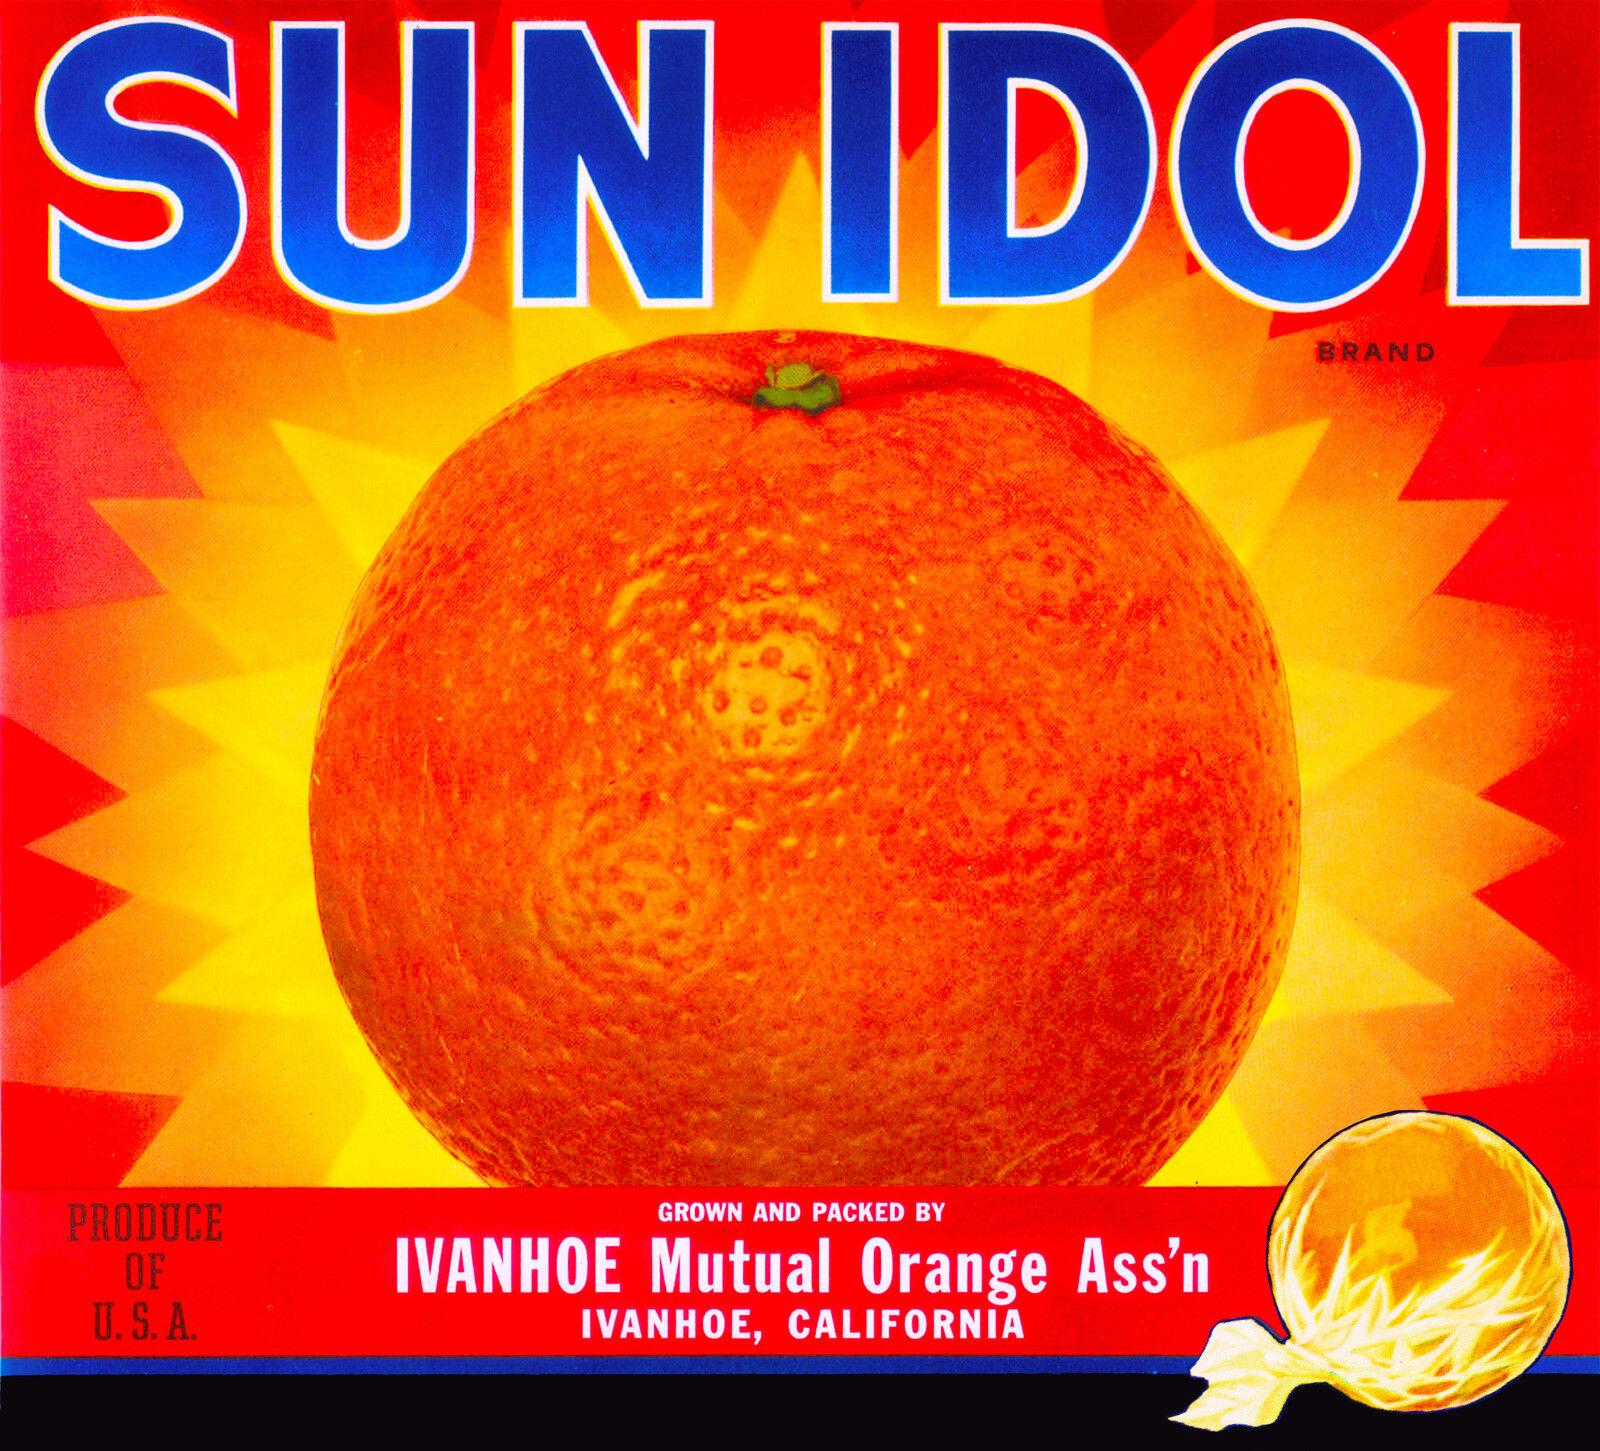 Exeter Tulare County Skyrocket  Orange Citrus Fruit Crate Label Print